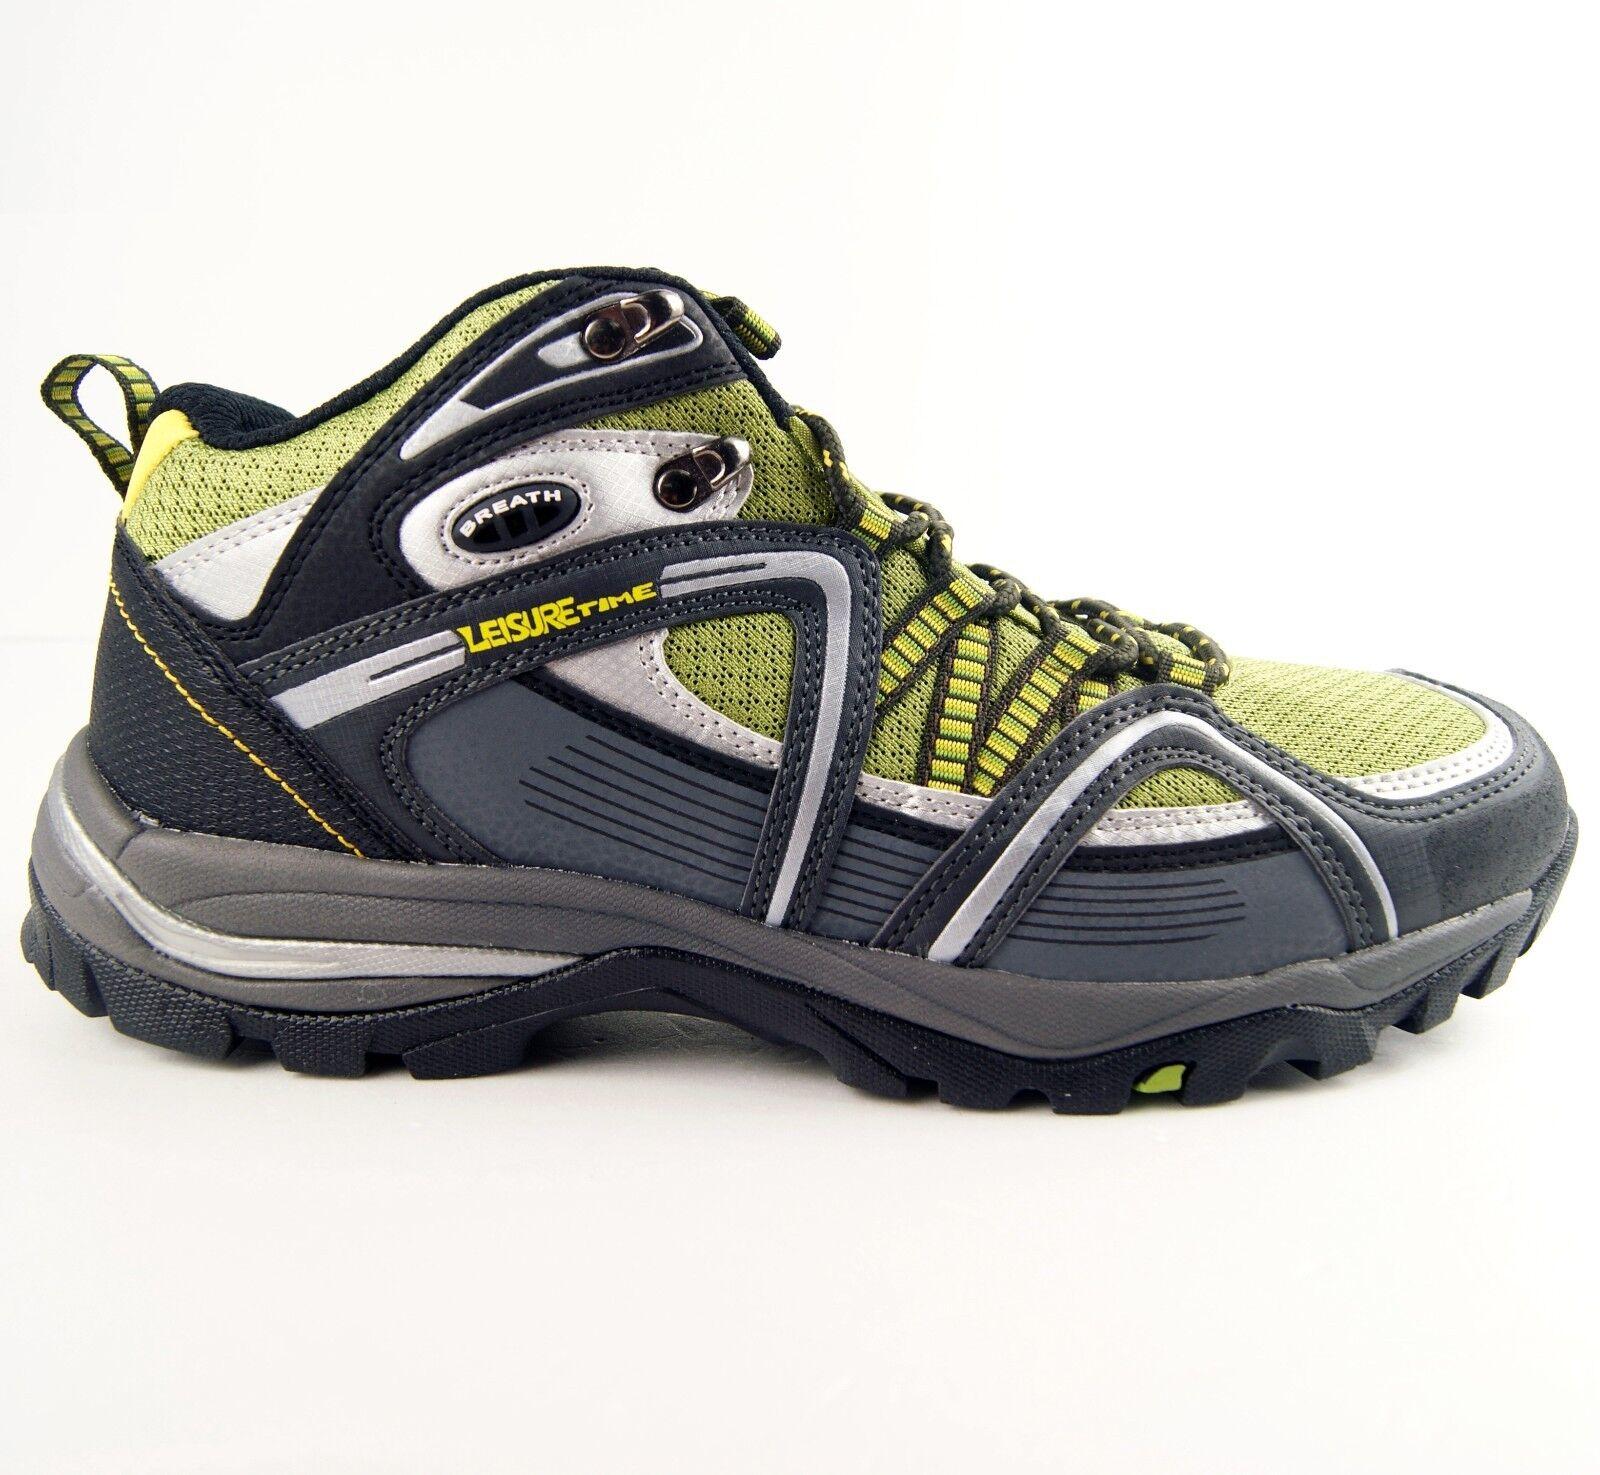 Treksta Dormite  Uomo Lesiure Time Dormite Treksta Mid Sports Grün Trekking Schuhes Hiking Stiefel e7b2f7